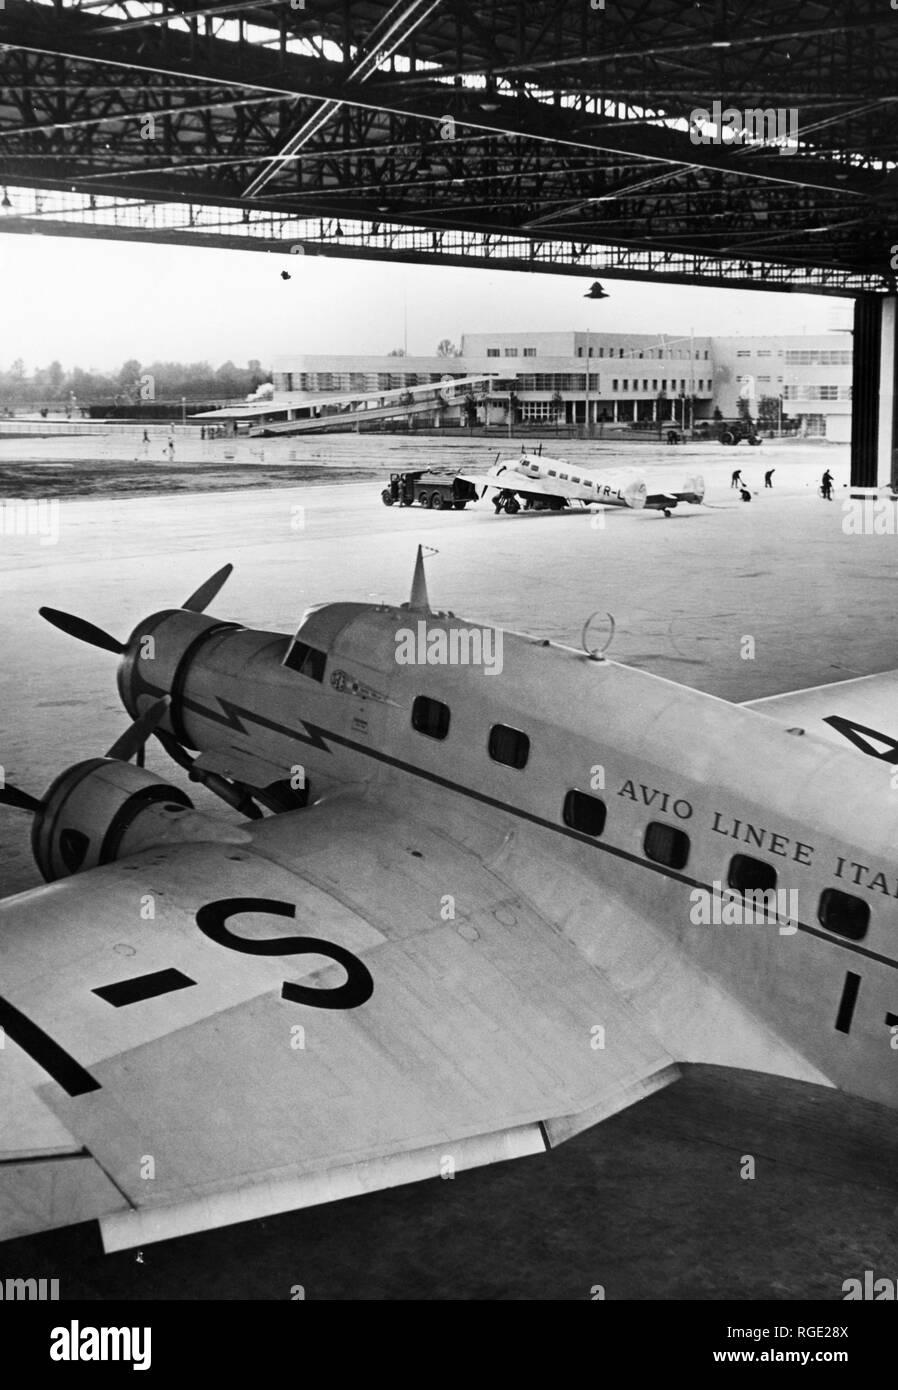 Italy, Milan, aircraft shed, linate, 1950-60 - Stock Image